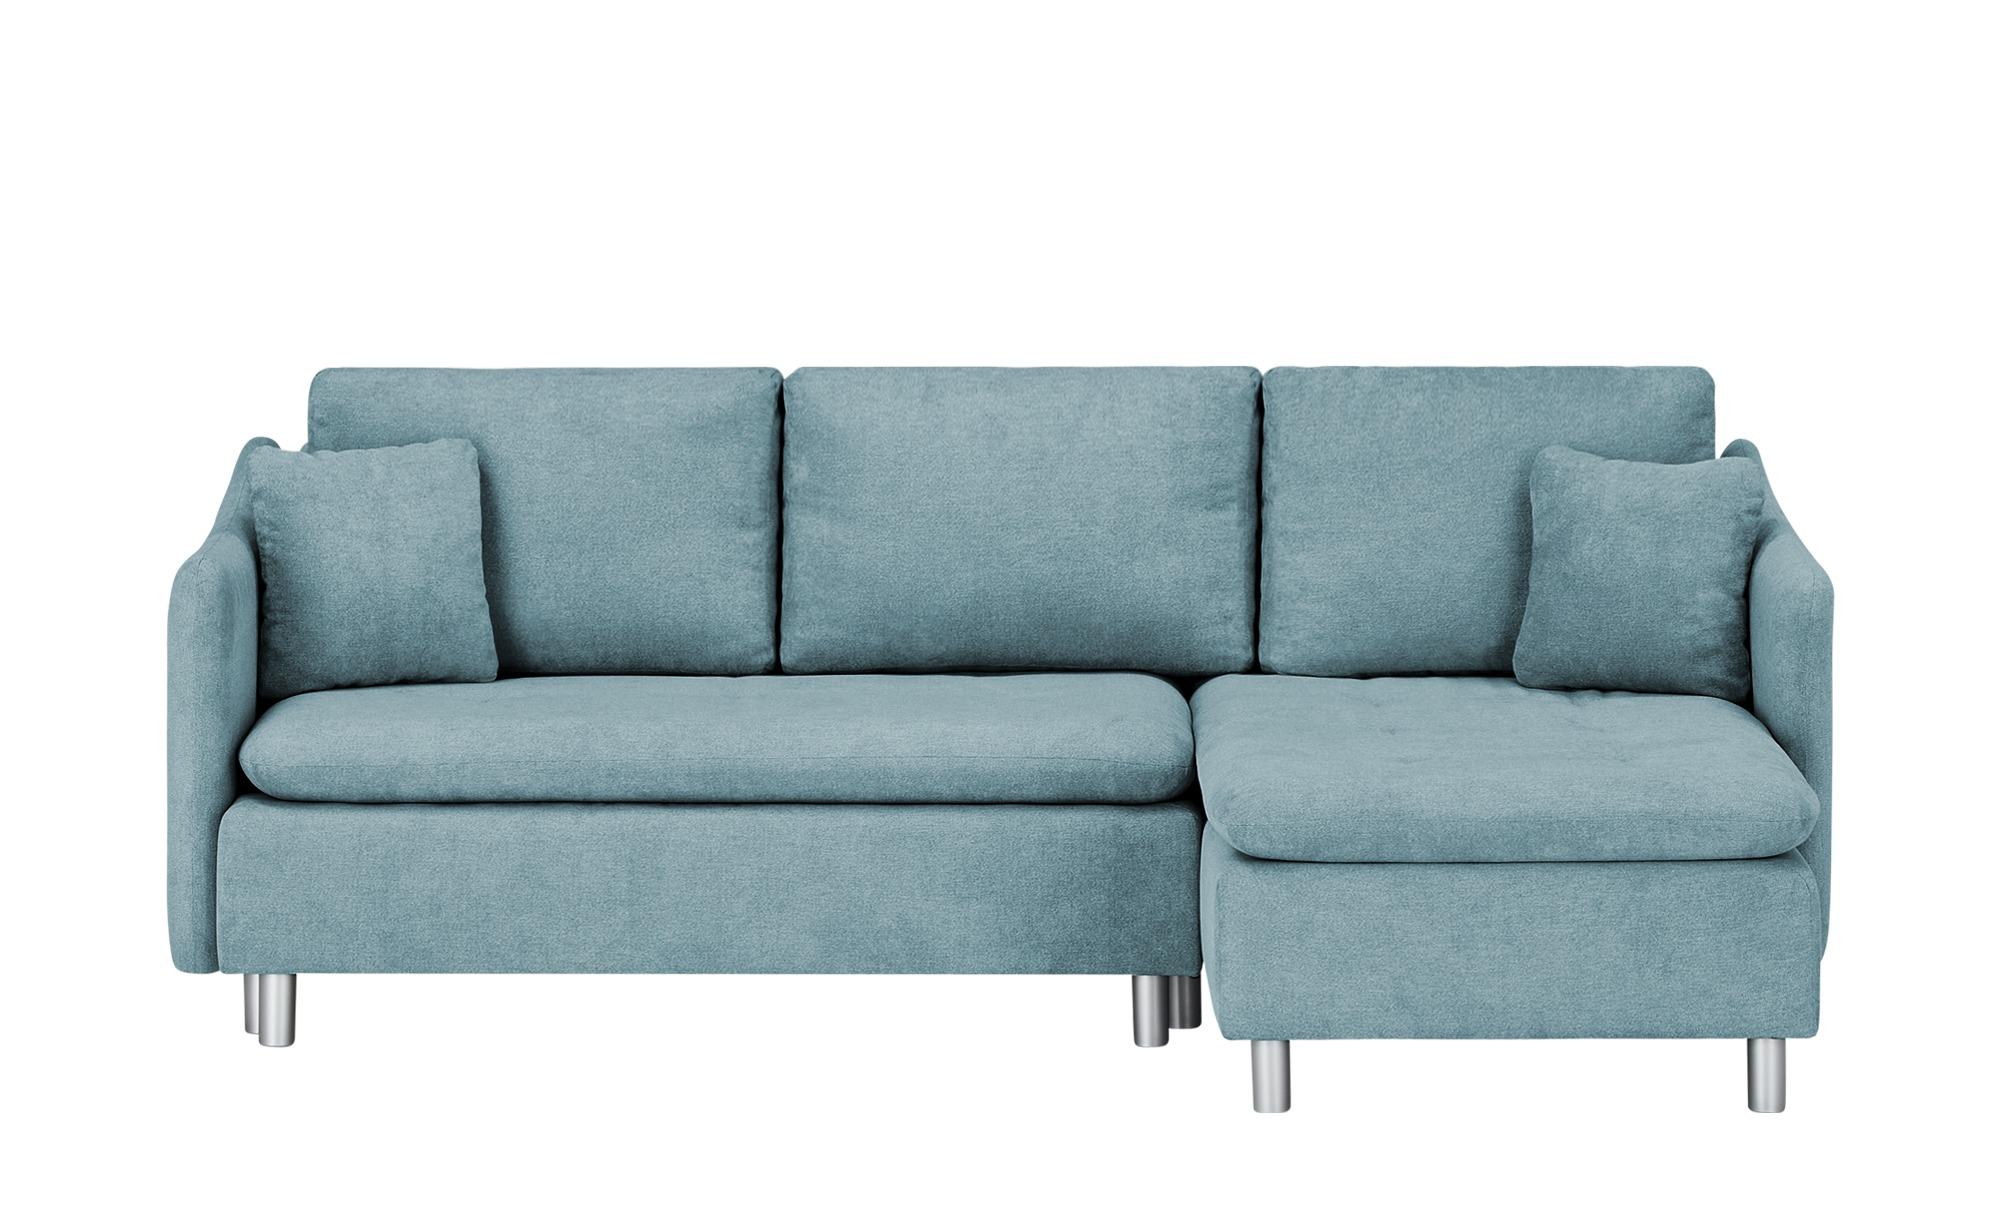 smart Ecksofa  Bonamie ¦ blau ¦ Maße (cm): H: 87 Polstermöbel > Sofas > Ecksofas - Höffner